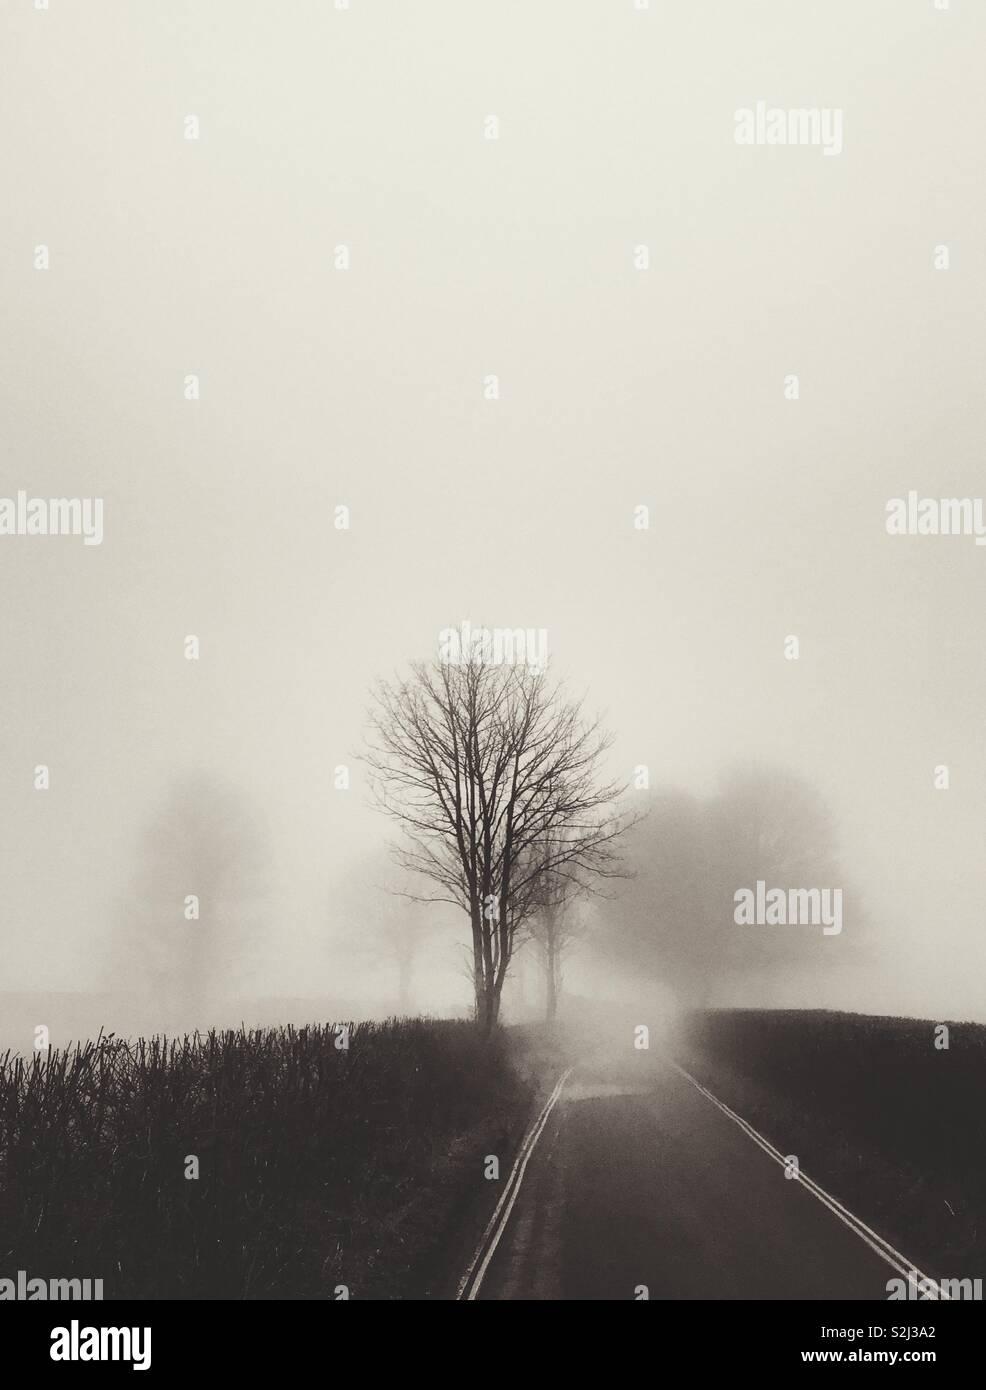 A foggy lane avec arbres Photo Stock